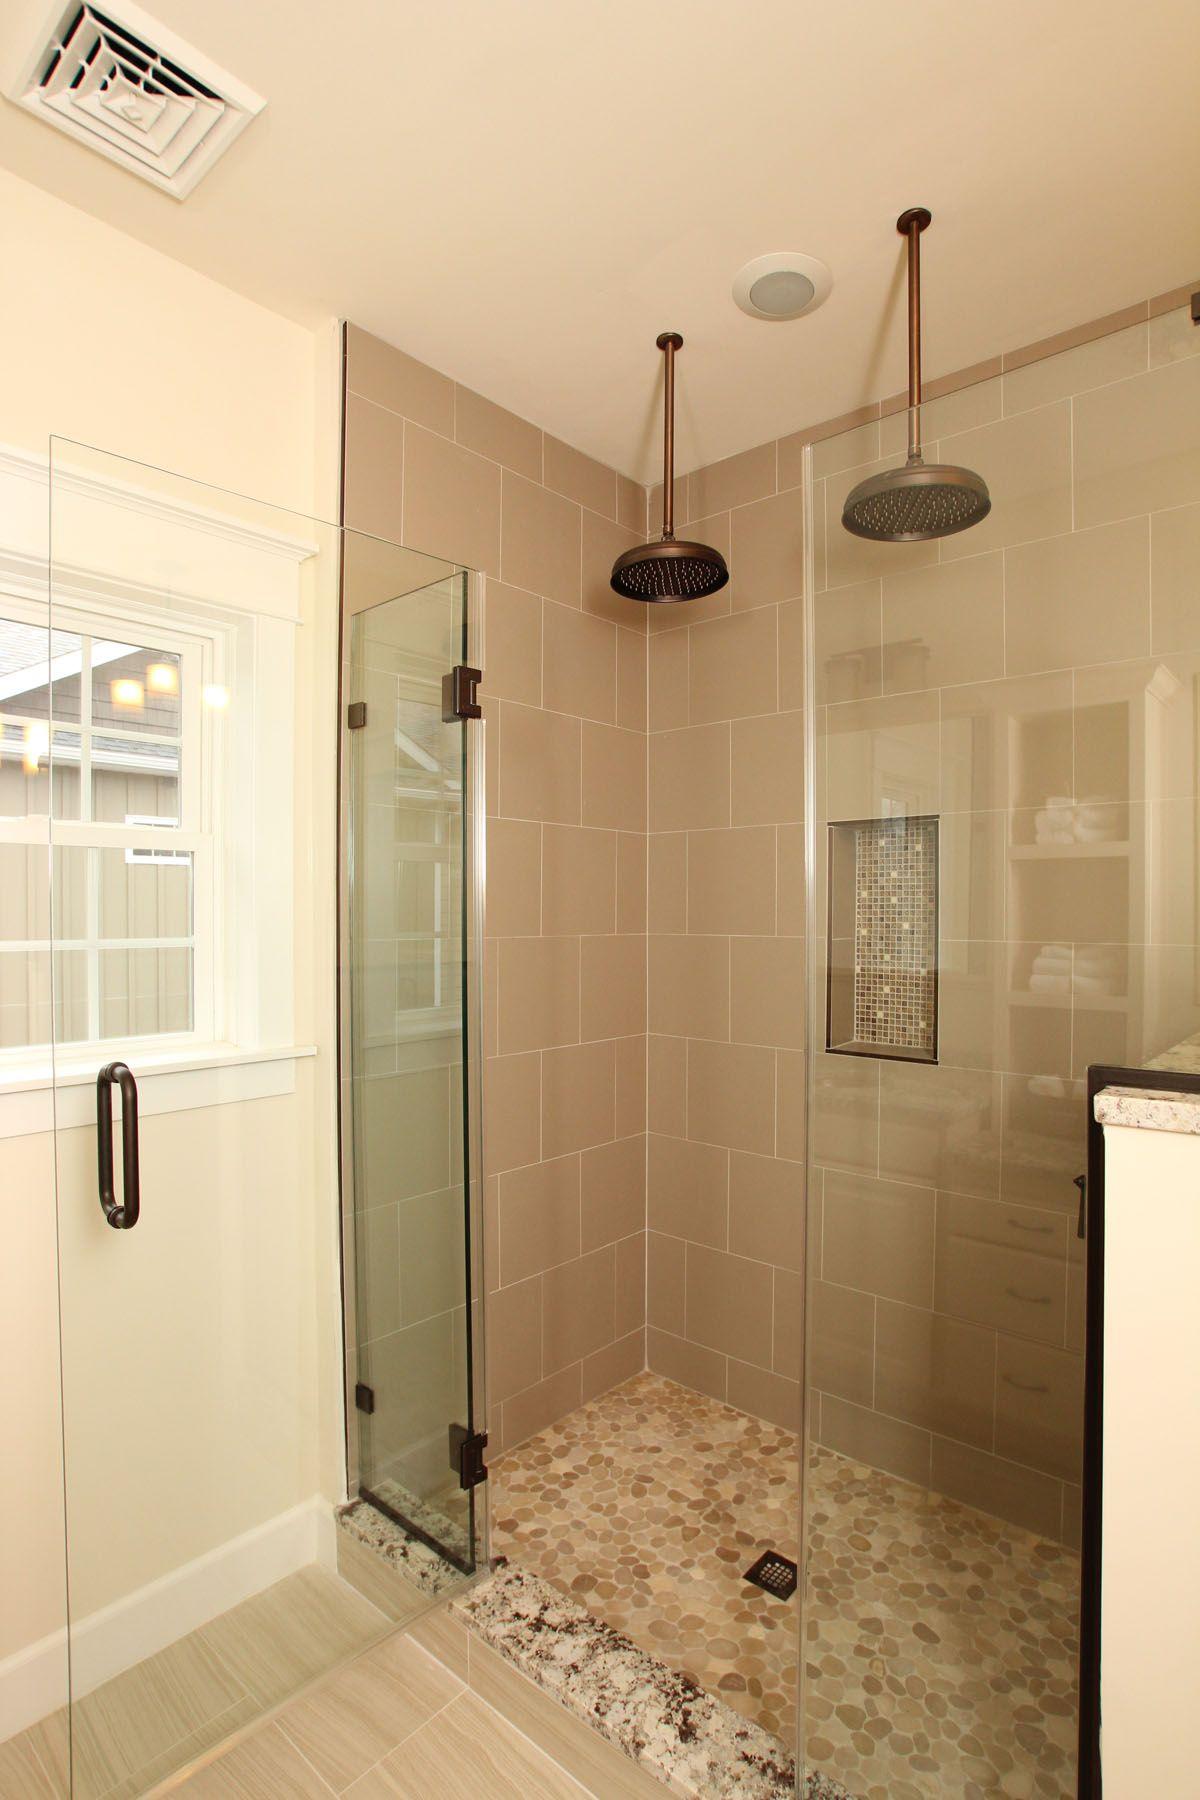 Double Rain Shower Heads In The Master Bath Shower Heads Bath Inspiration Master Bath Remodel